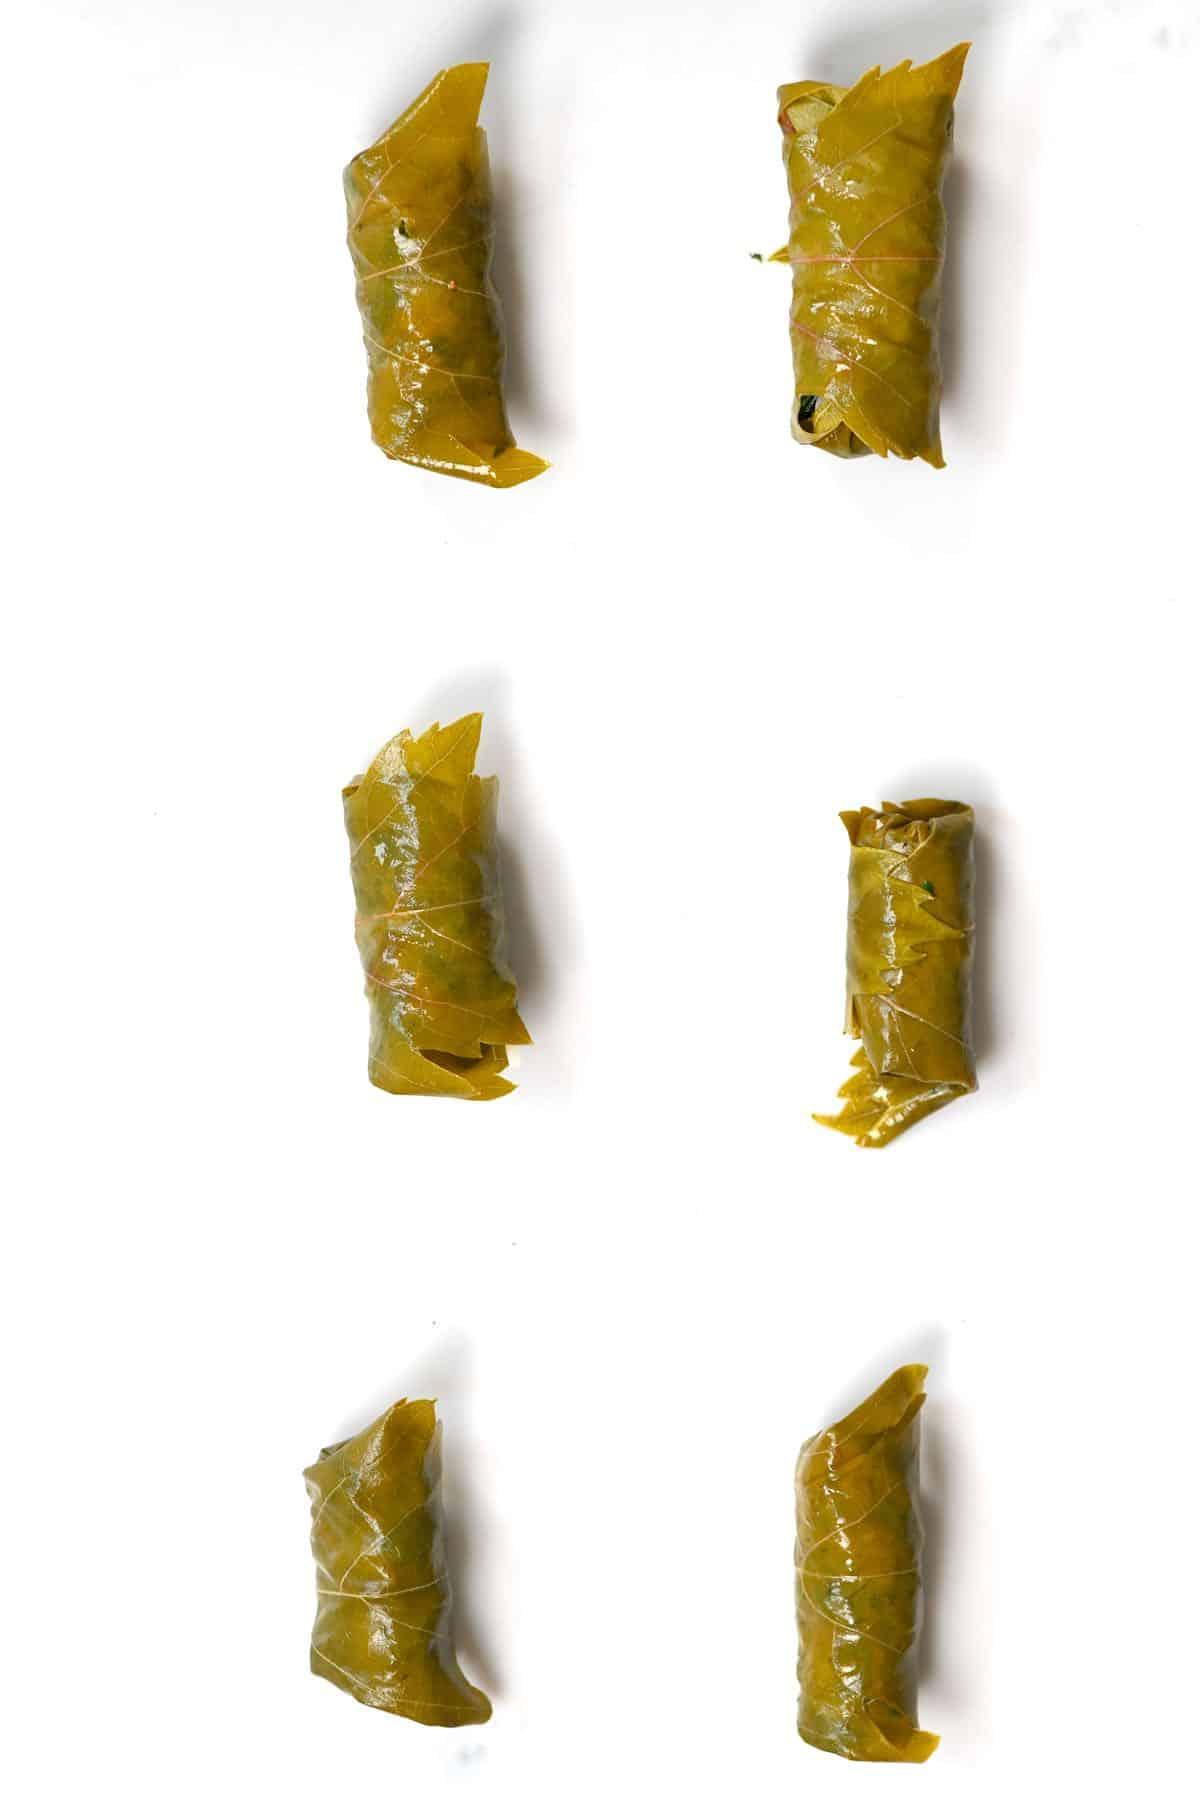 Six stuffed vine leaves